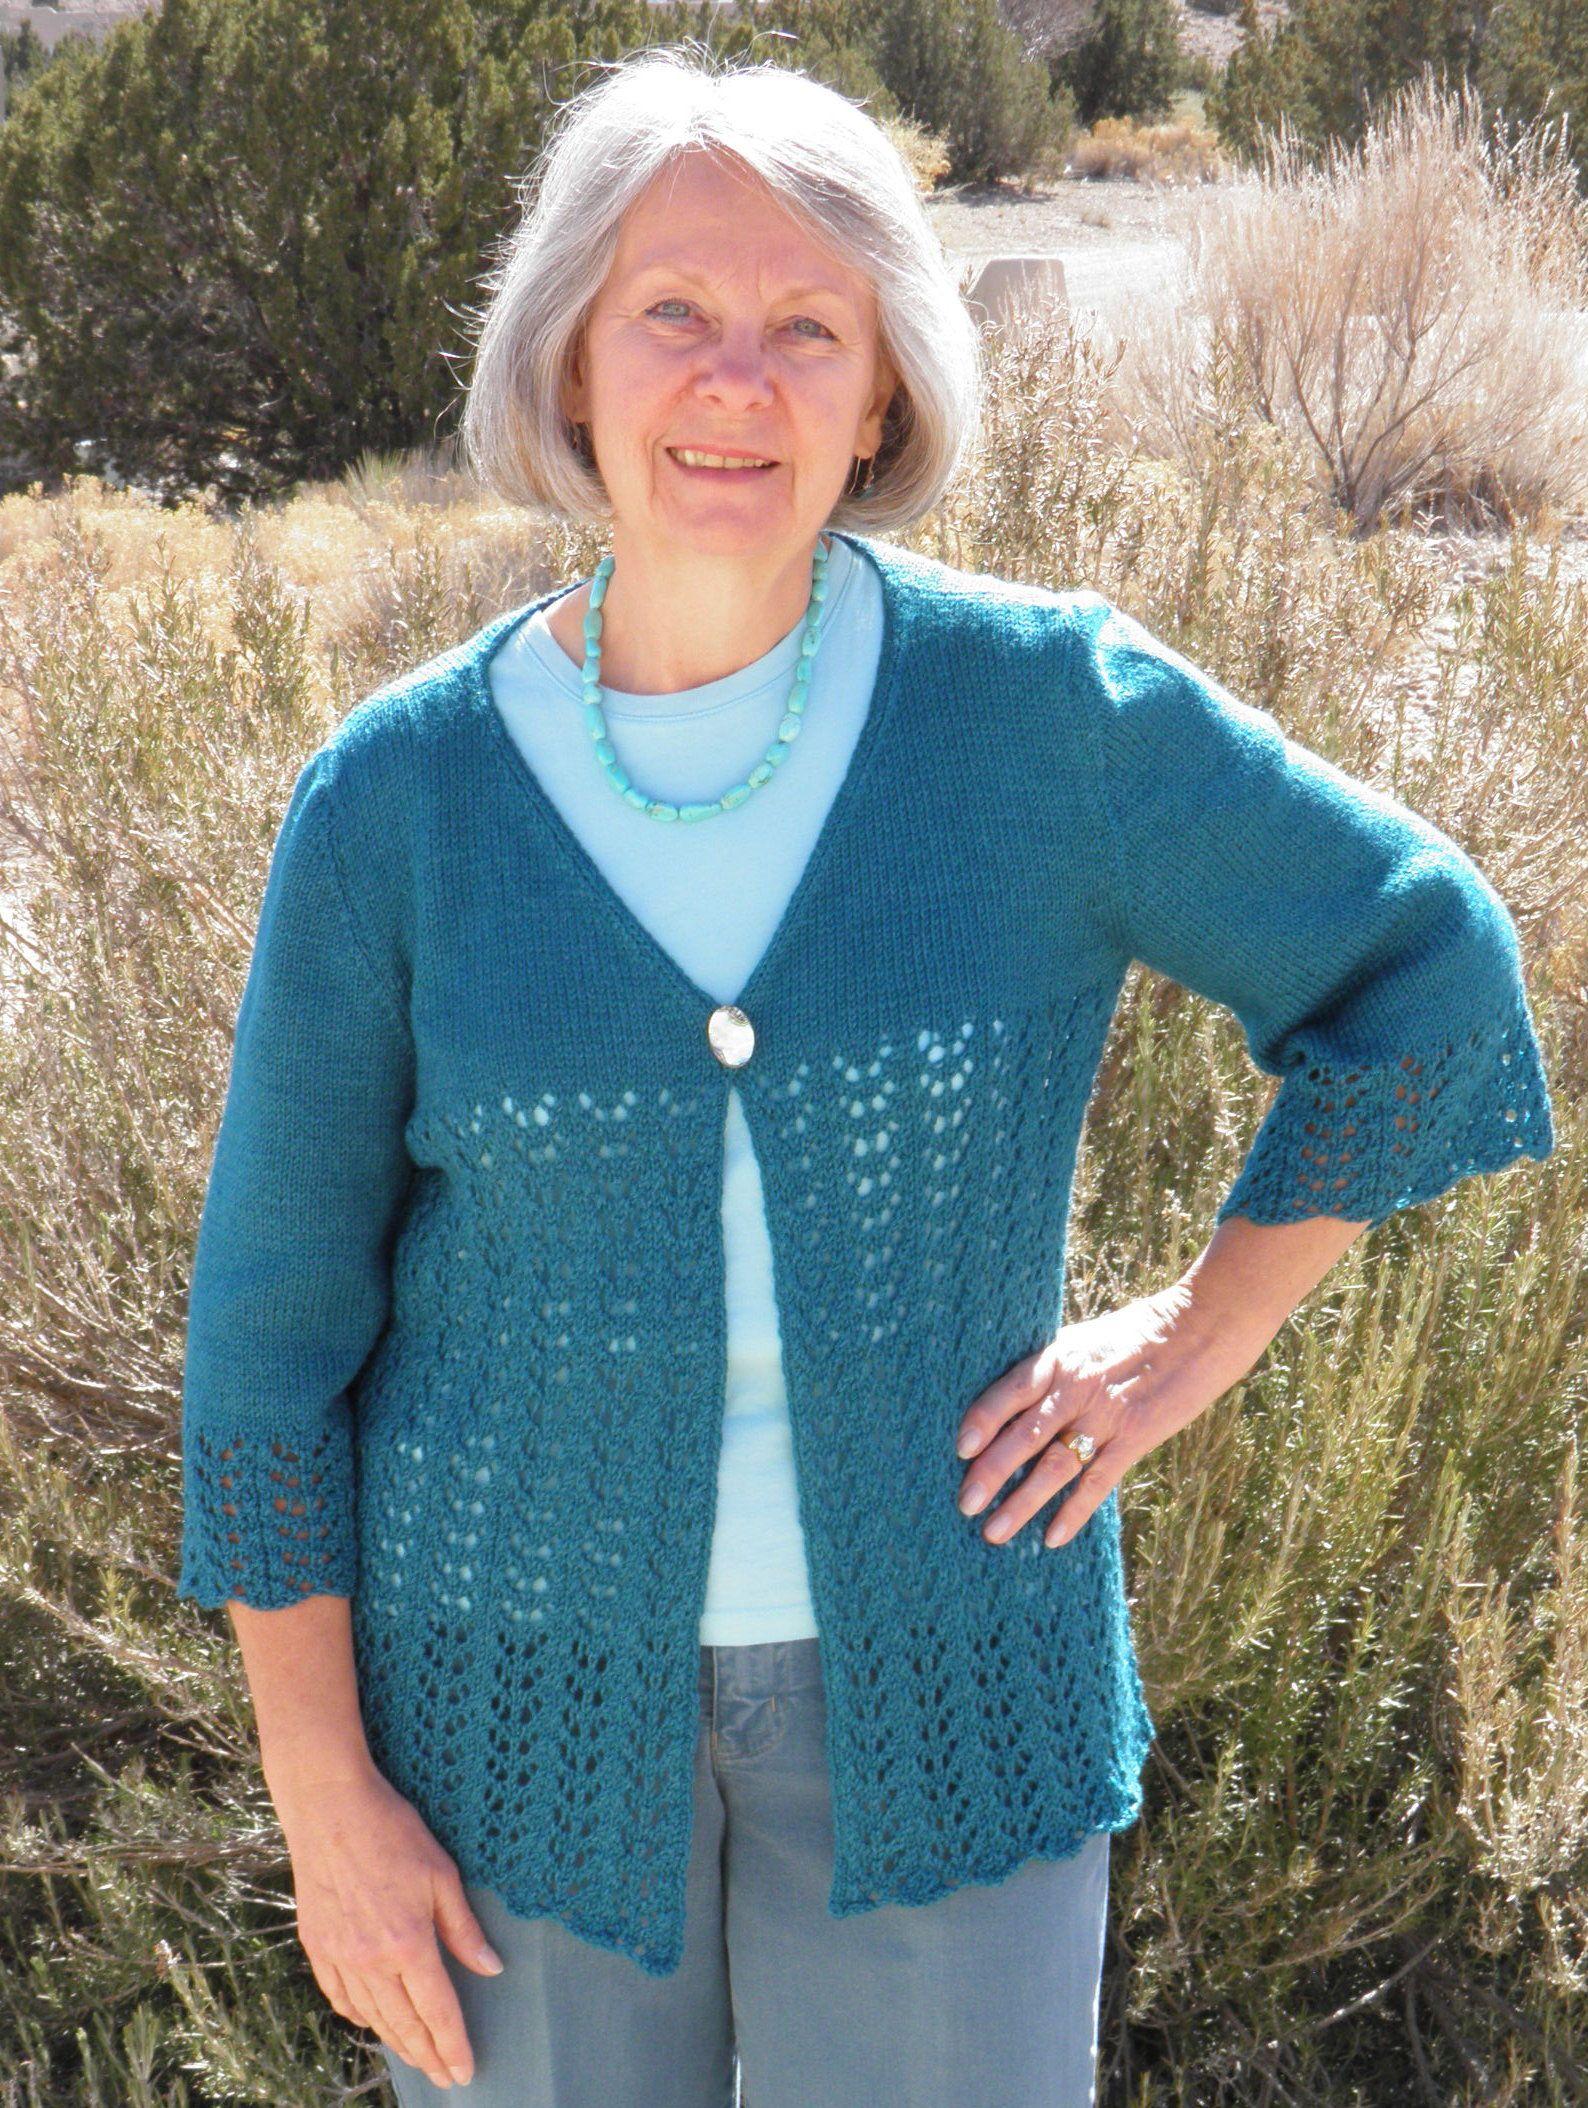 Laurel Lace Cardigan Pattern - Knitting Patterns and Crochet ...